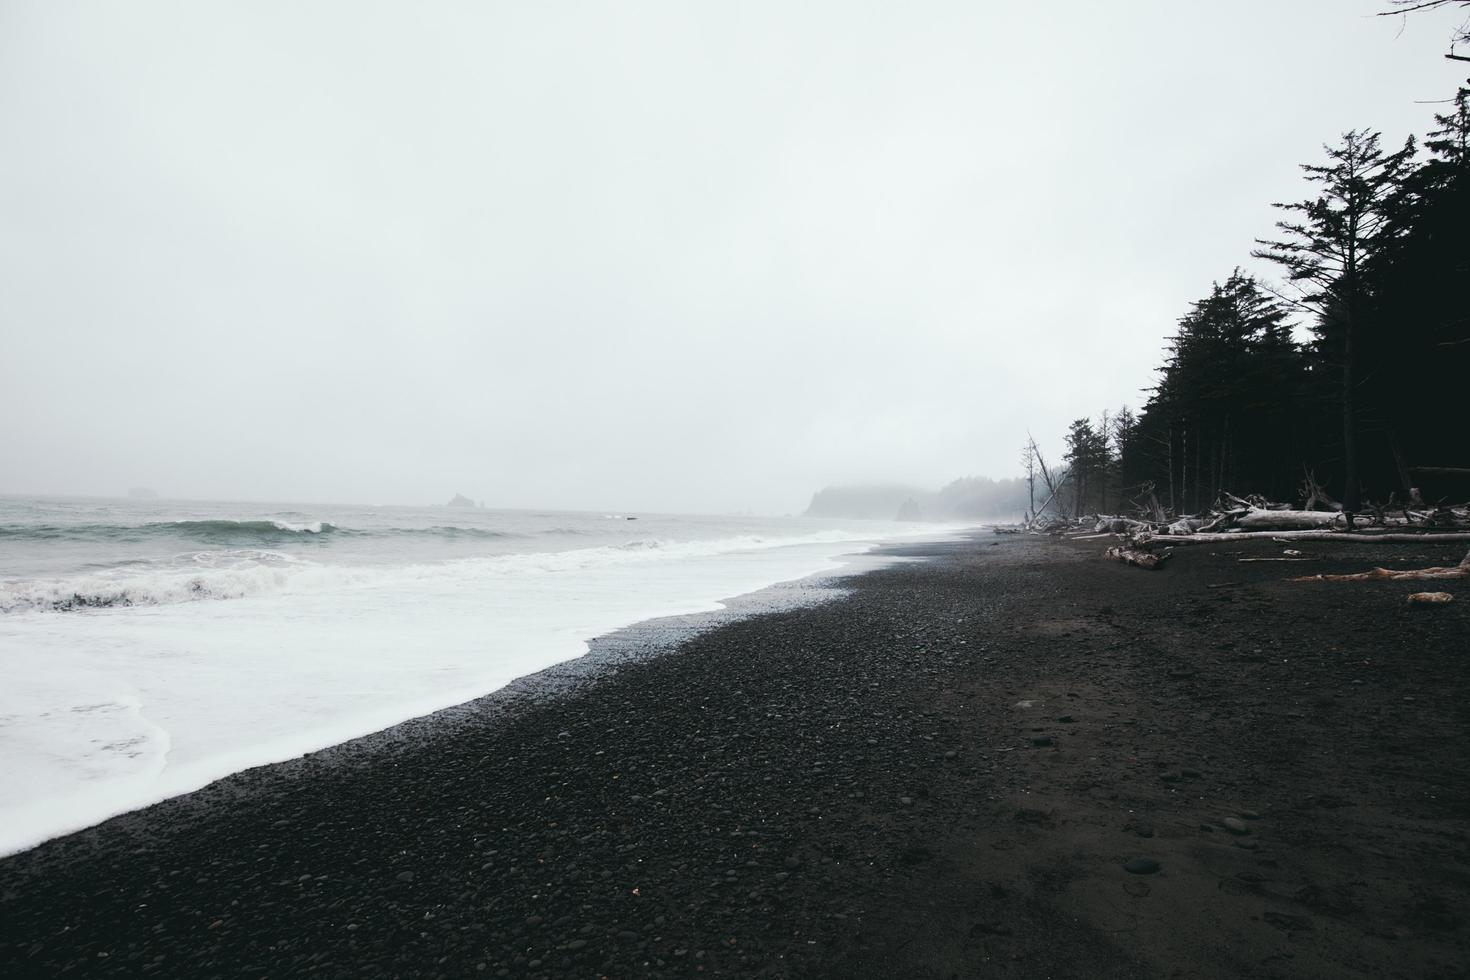 Grayscale photography of seashore photo